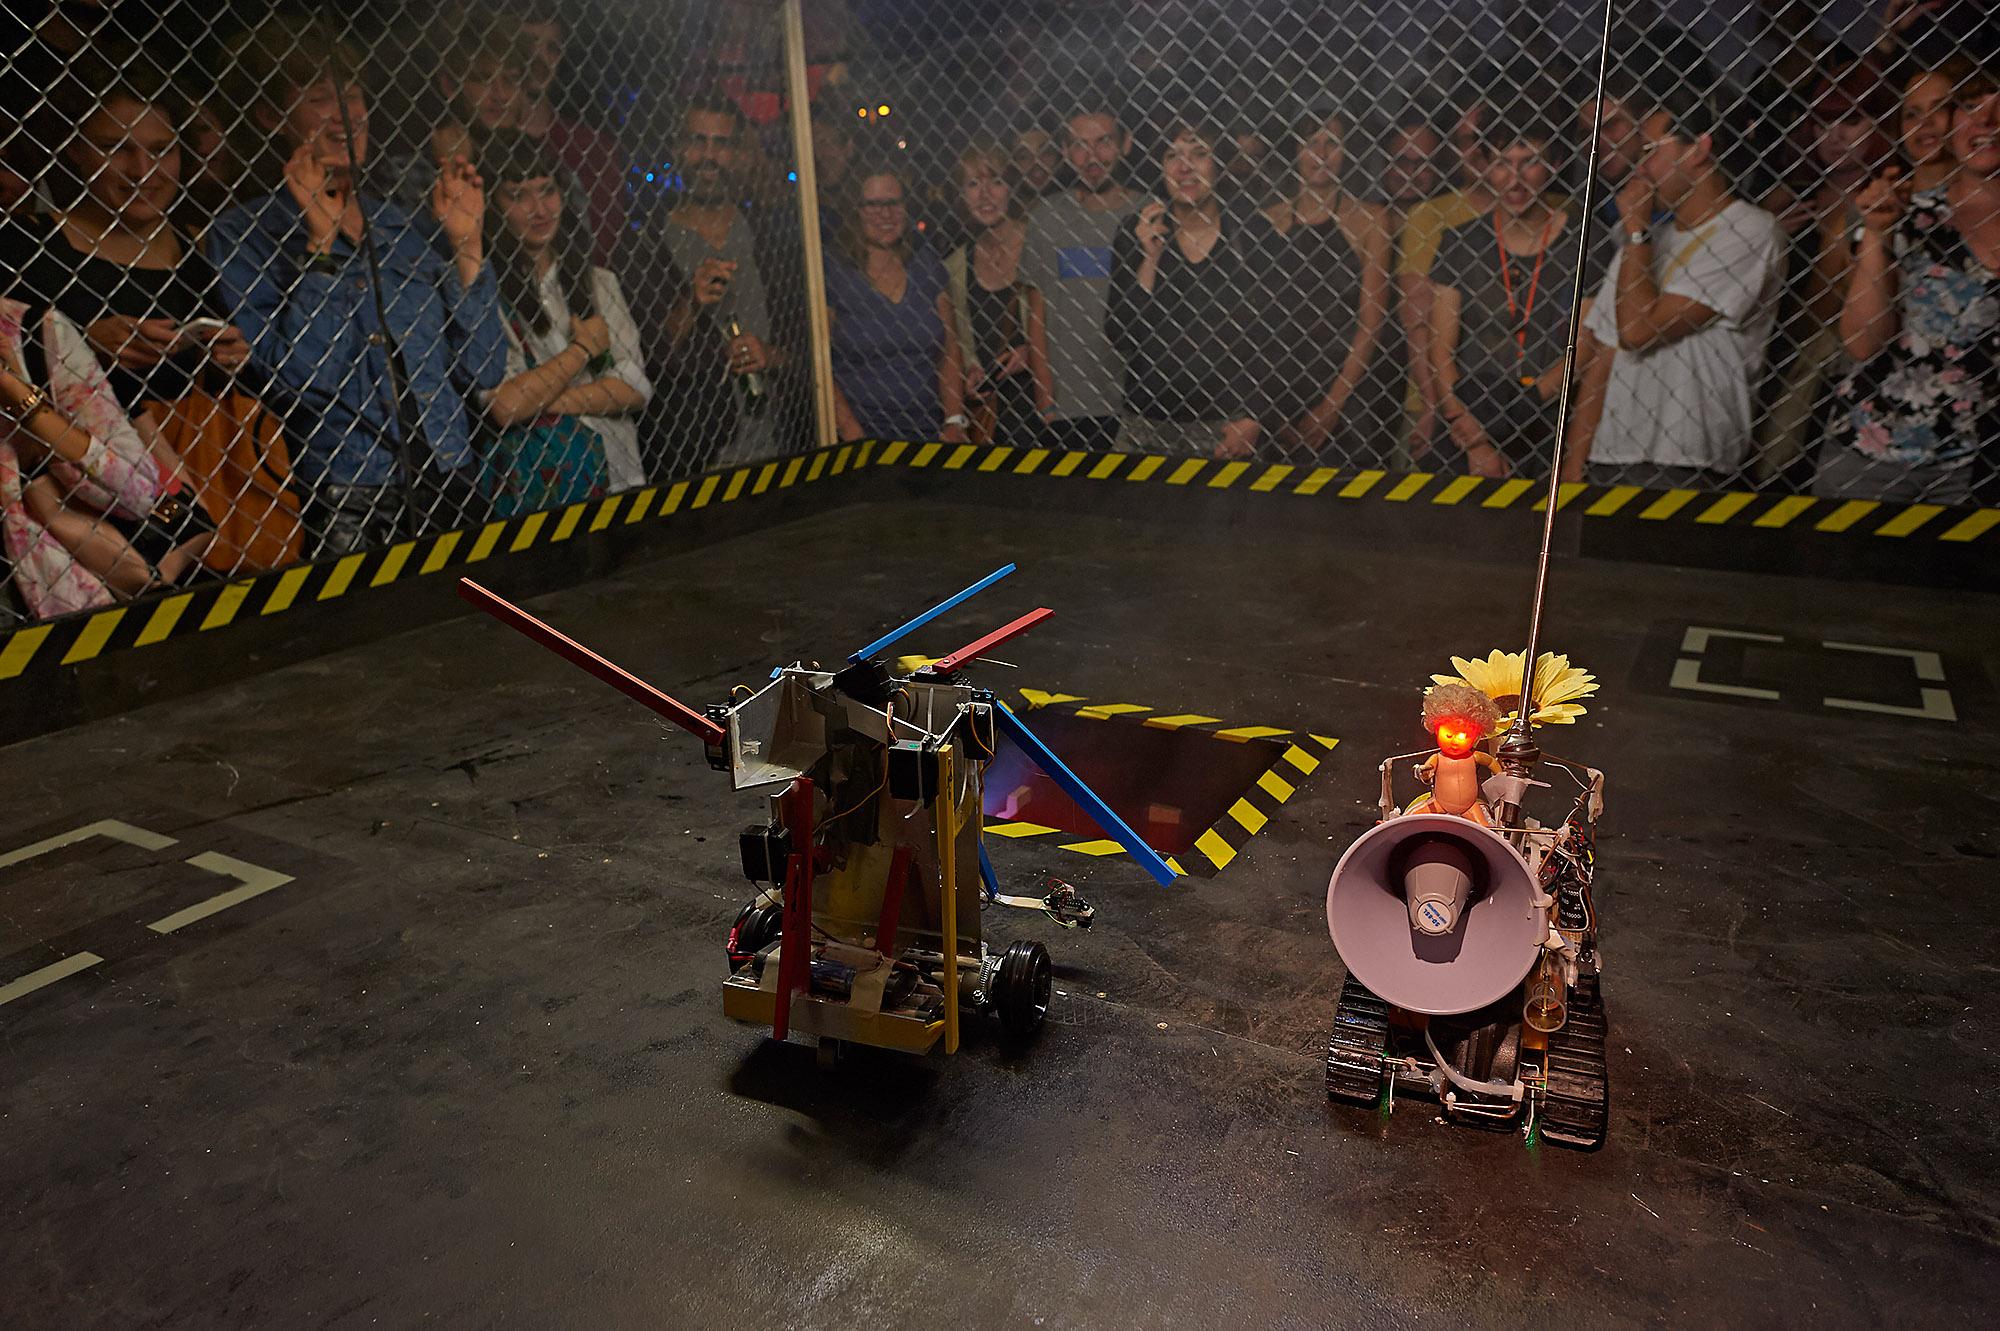 Terminator Tornament – The Robot Battle, Fighting Arena